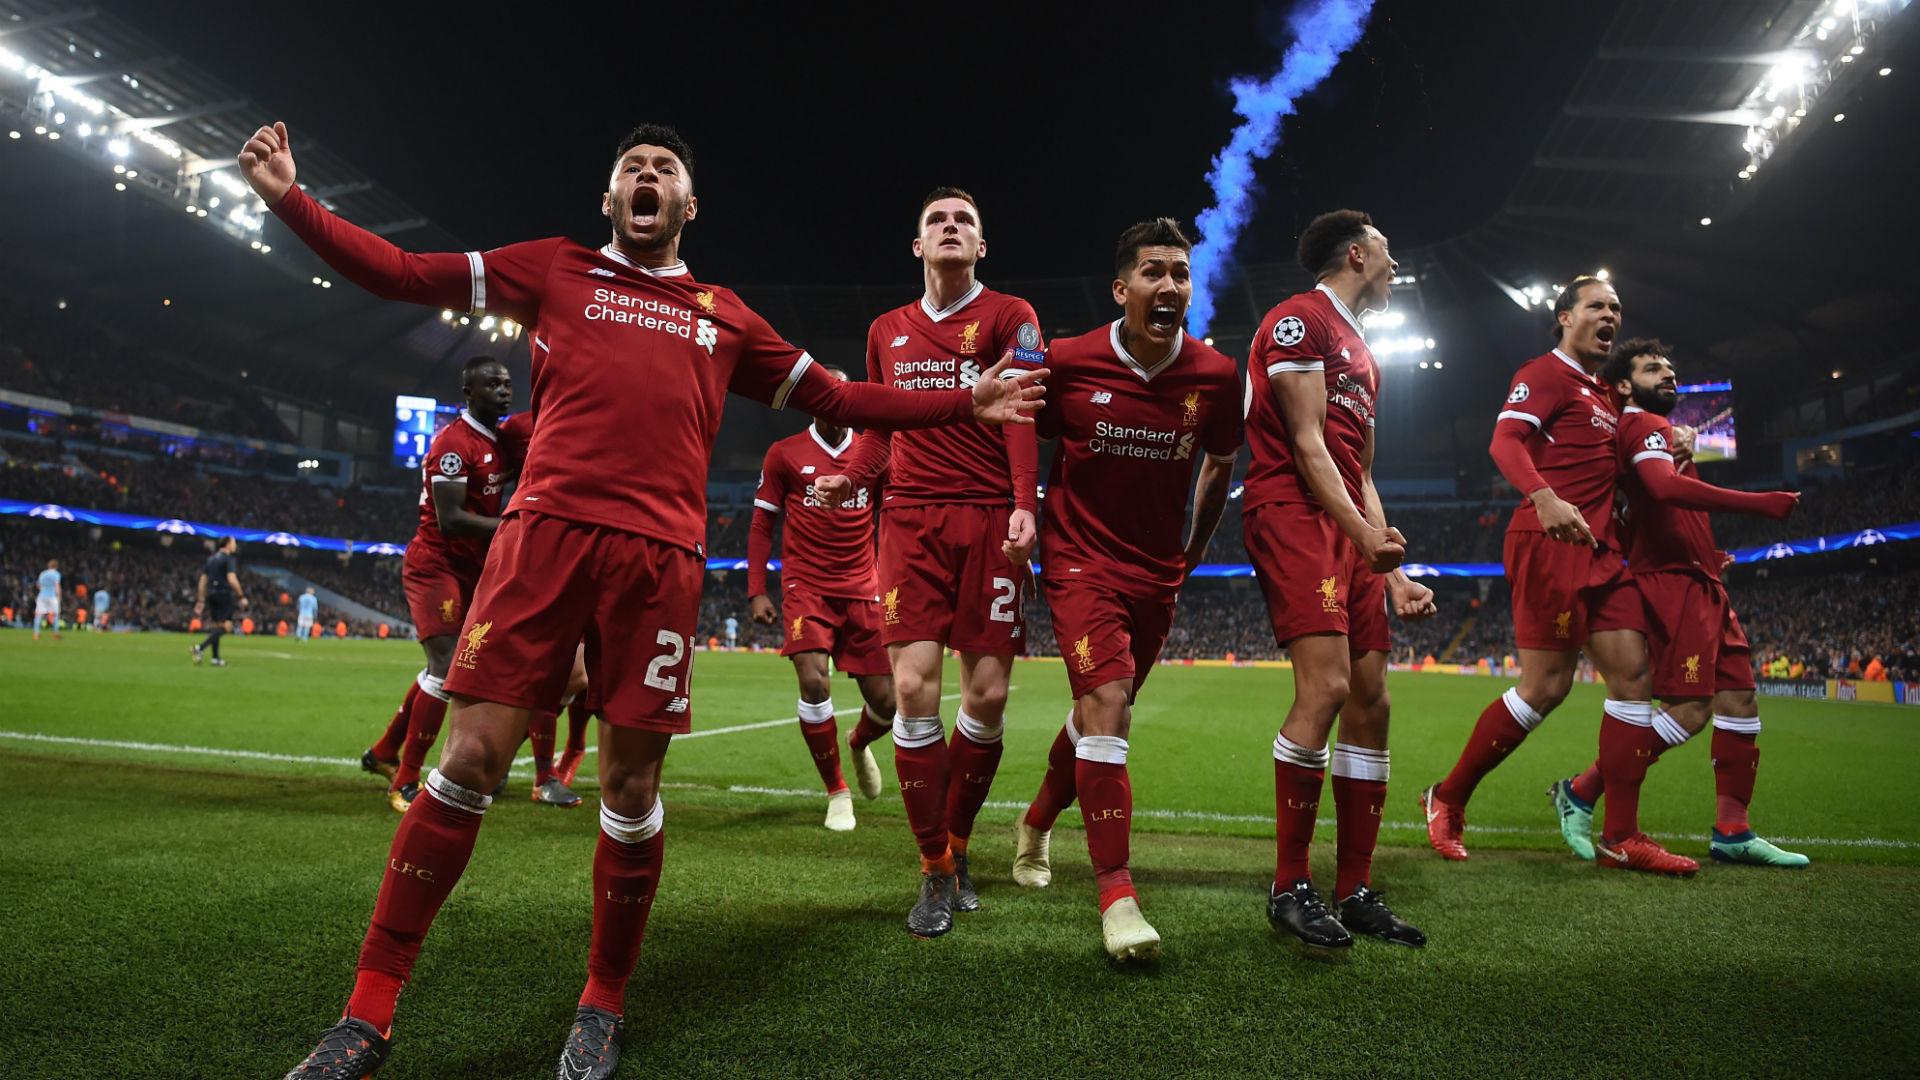 Liverpool Wallpaper 2018 (79+ images)